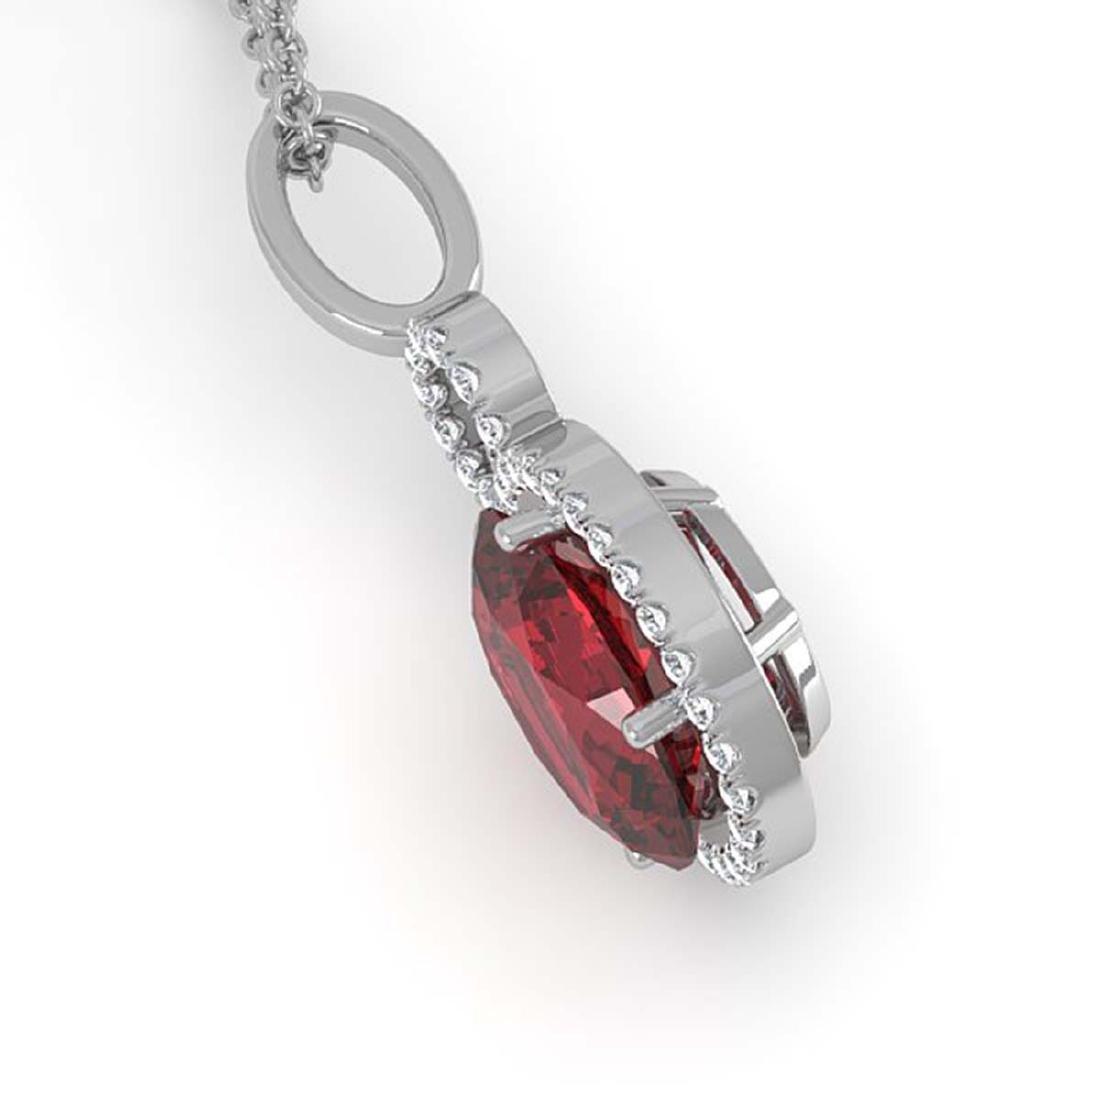 4 ctw Garnet & Halo VS/SI Diamond Necklace 14K White - 2